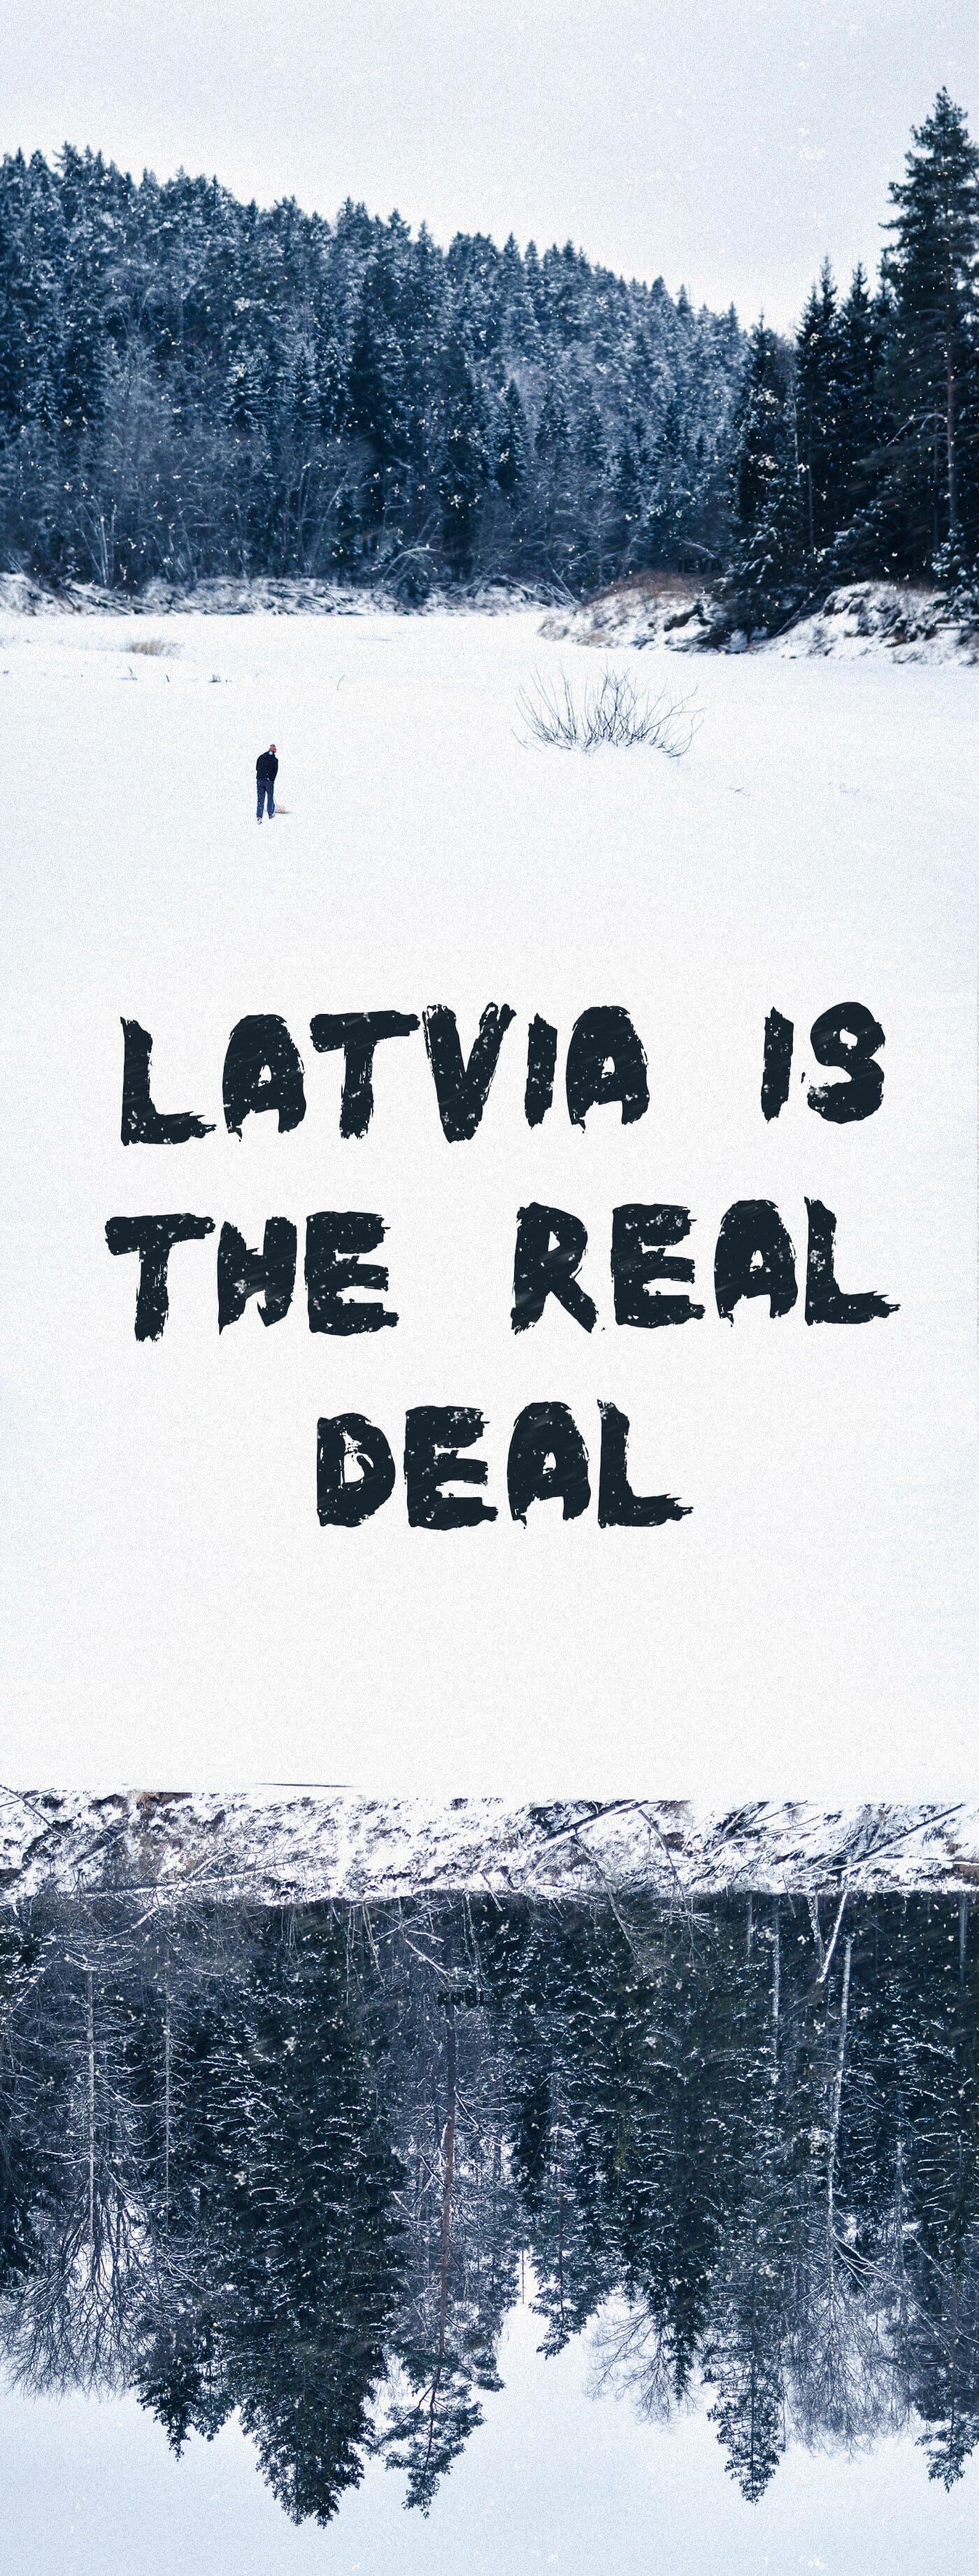 free font Free font brush handwritten Brush font freebie Latvia lettering winter forest pics instagram dark